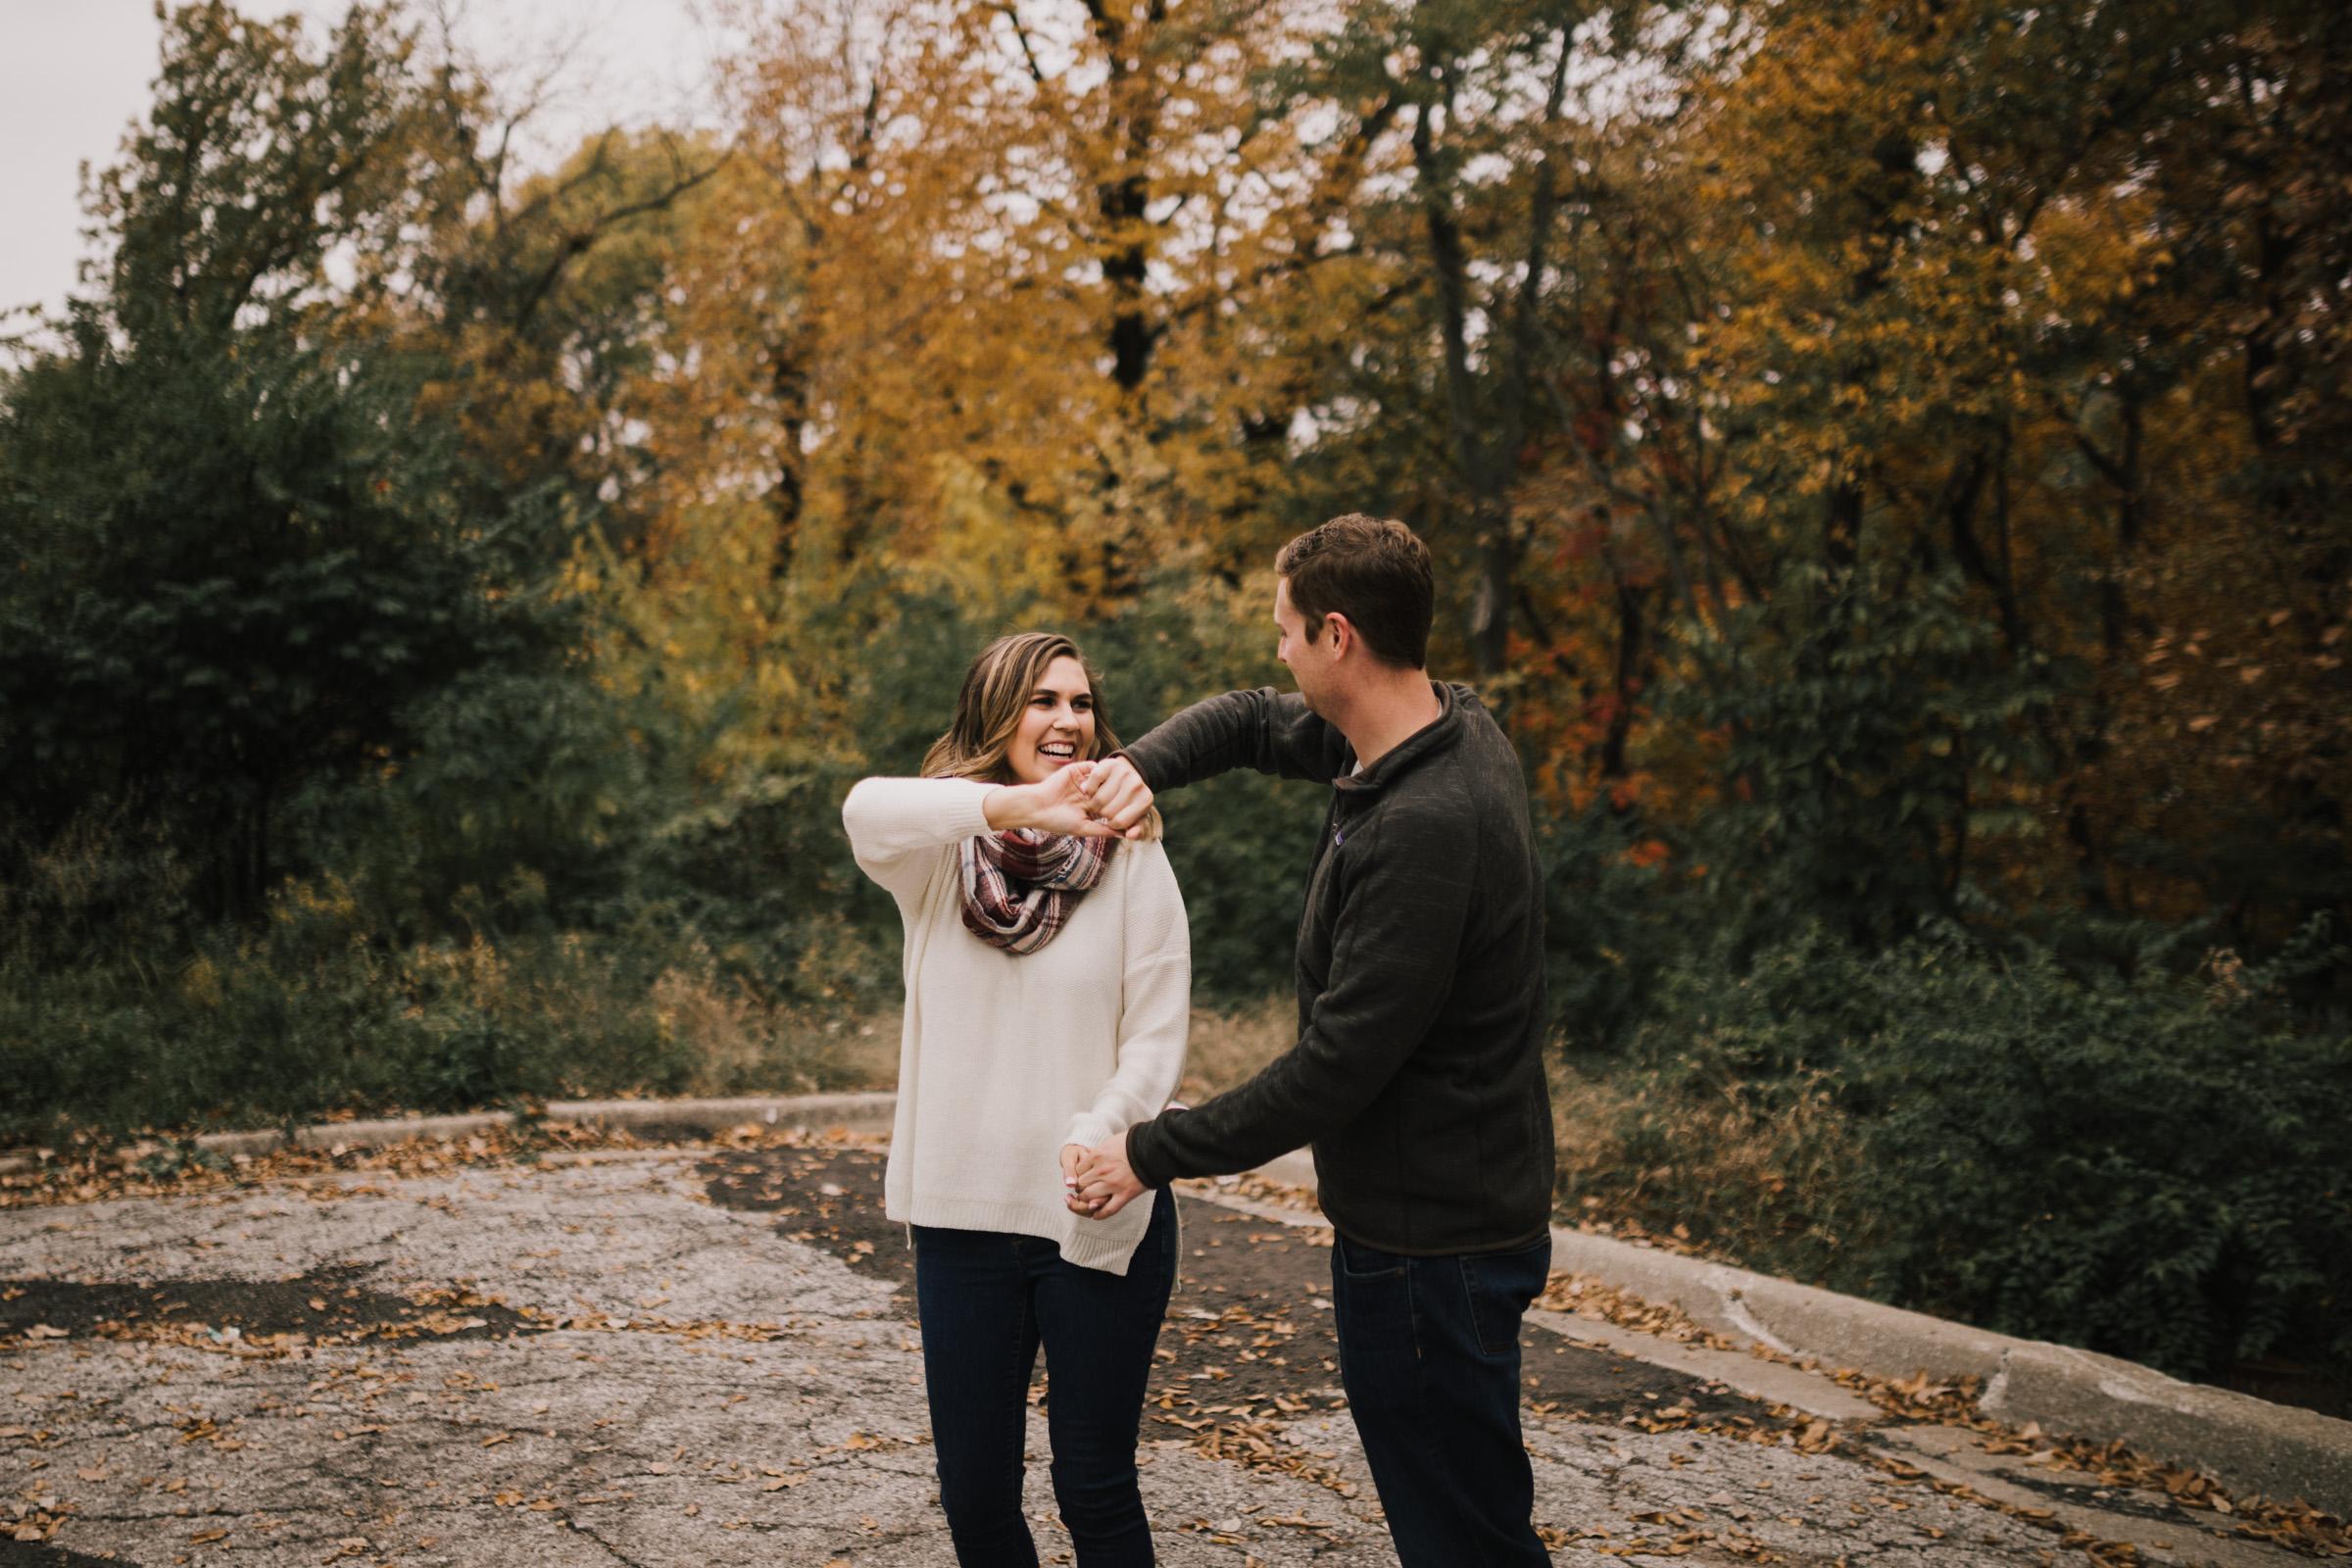 alyssa barletter photography downtown kansas city engagement photos rosedale arch wedding photographer-4.jpg